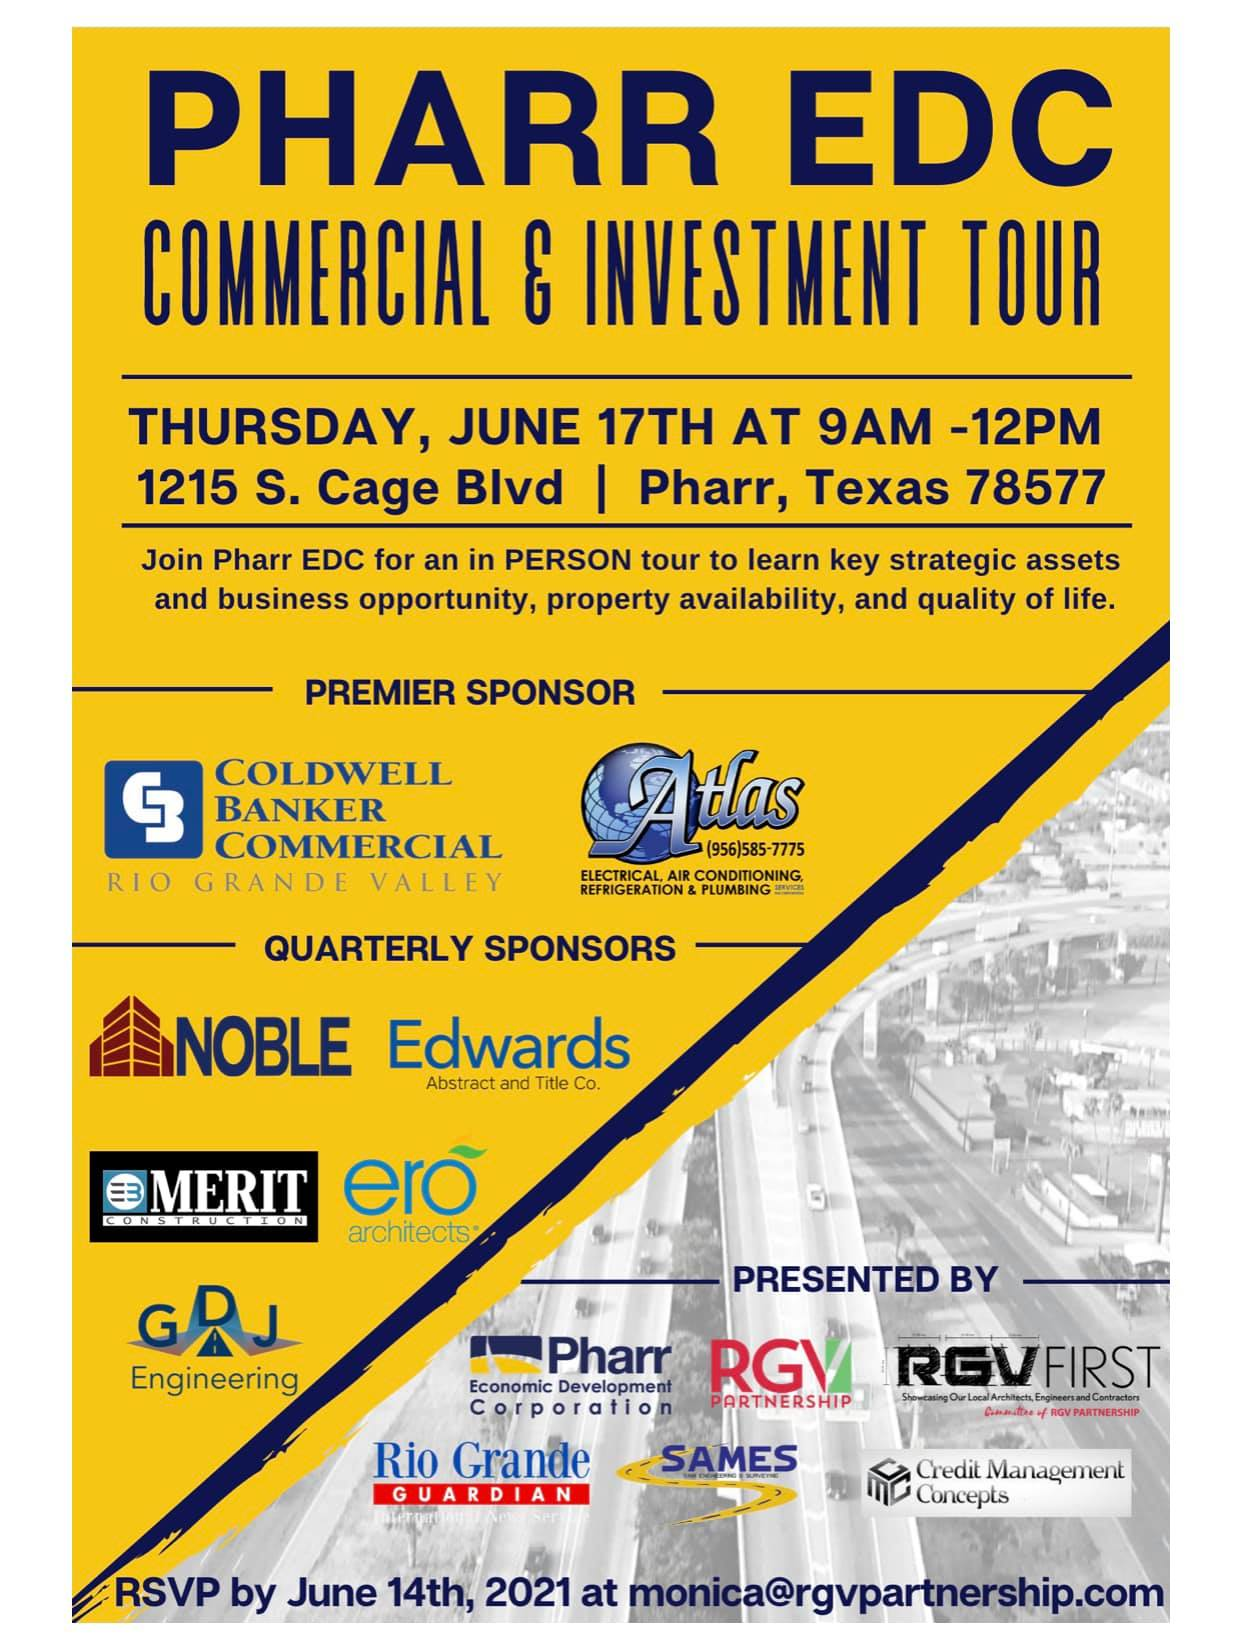 Pharr Commercial Property Tour